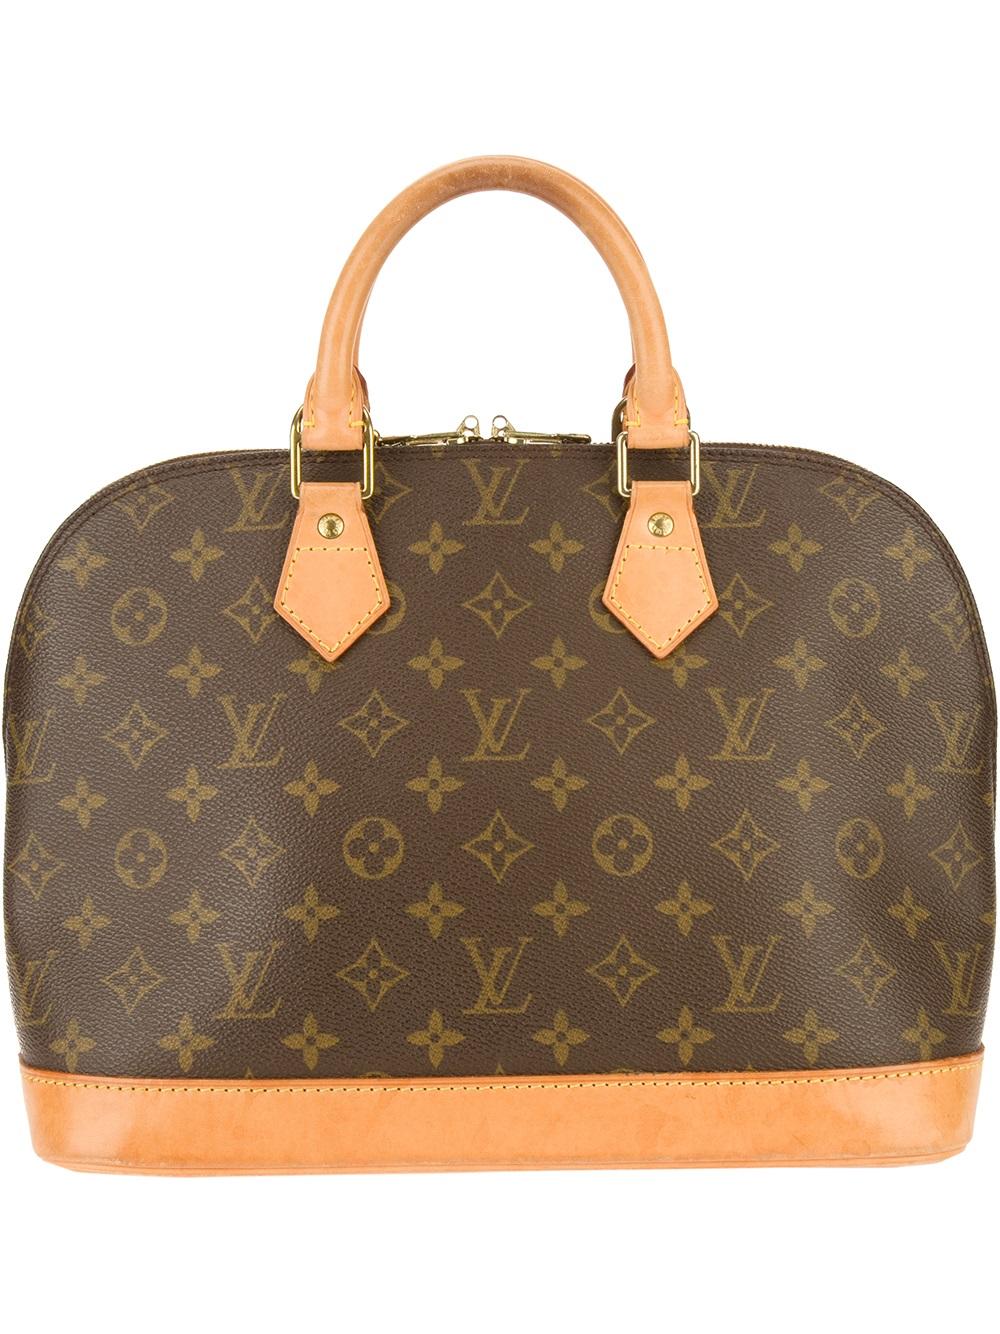 louis vuitton alma handbag in brown lyst